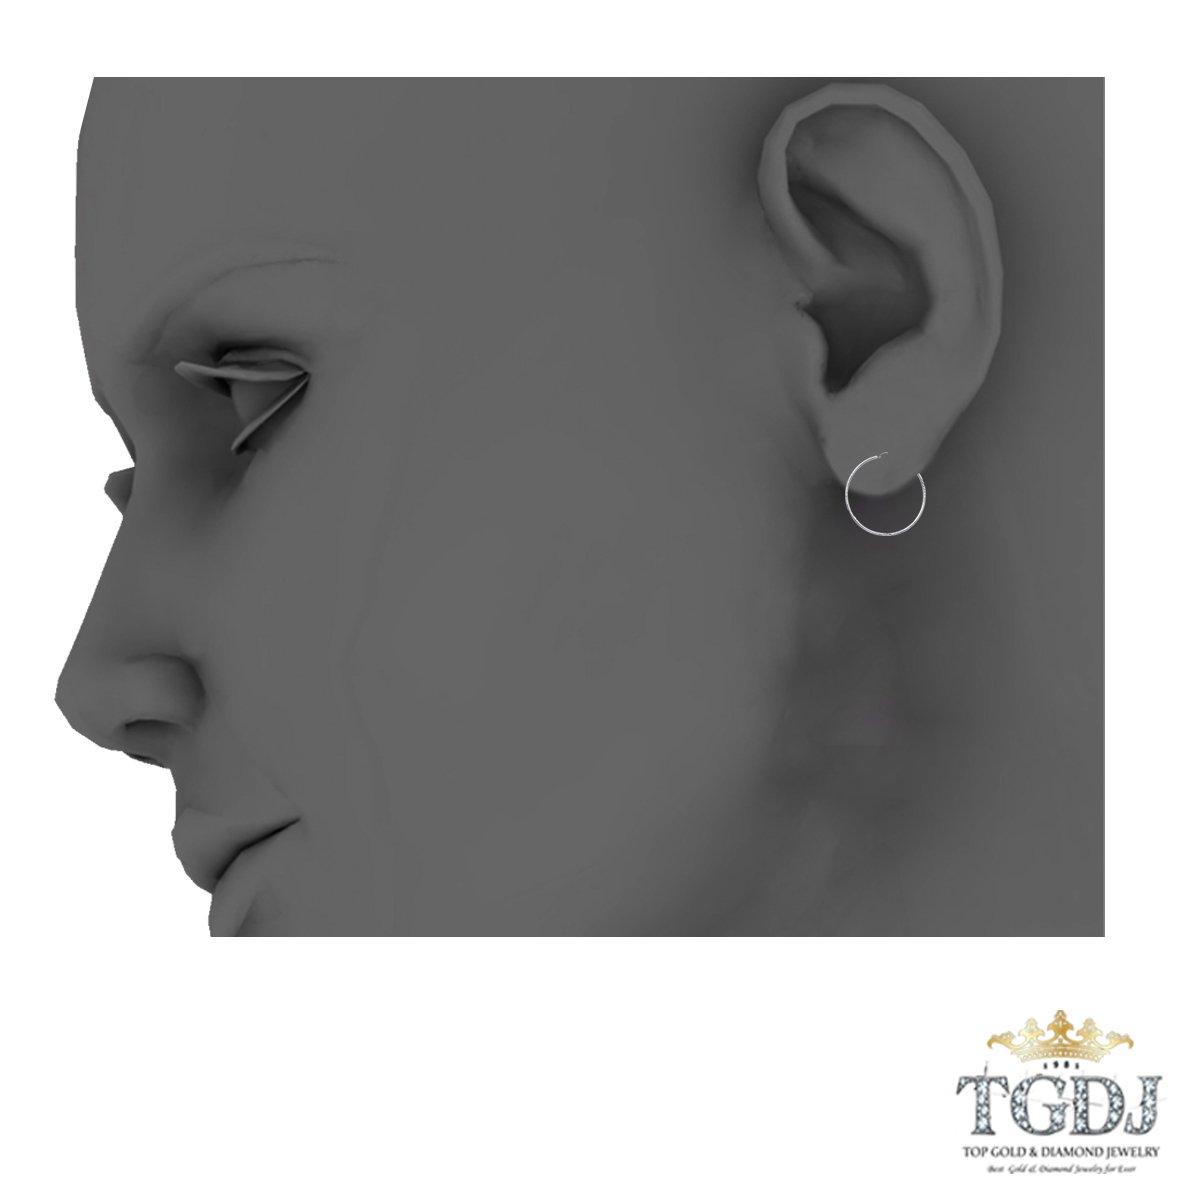 14K White Gold 2mm Thickness Hinged Diamond Cut Hoop Earrings Diameter 13mm